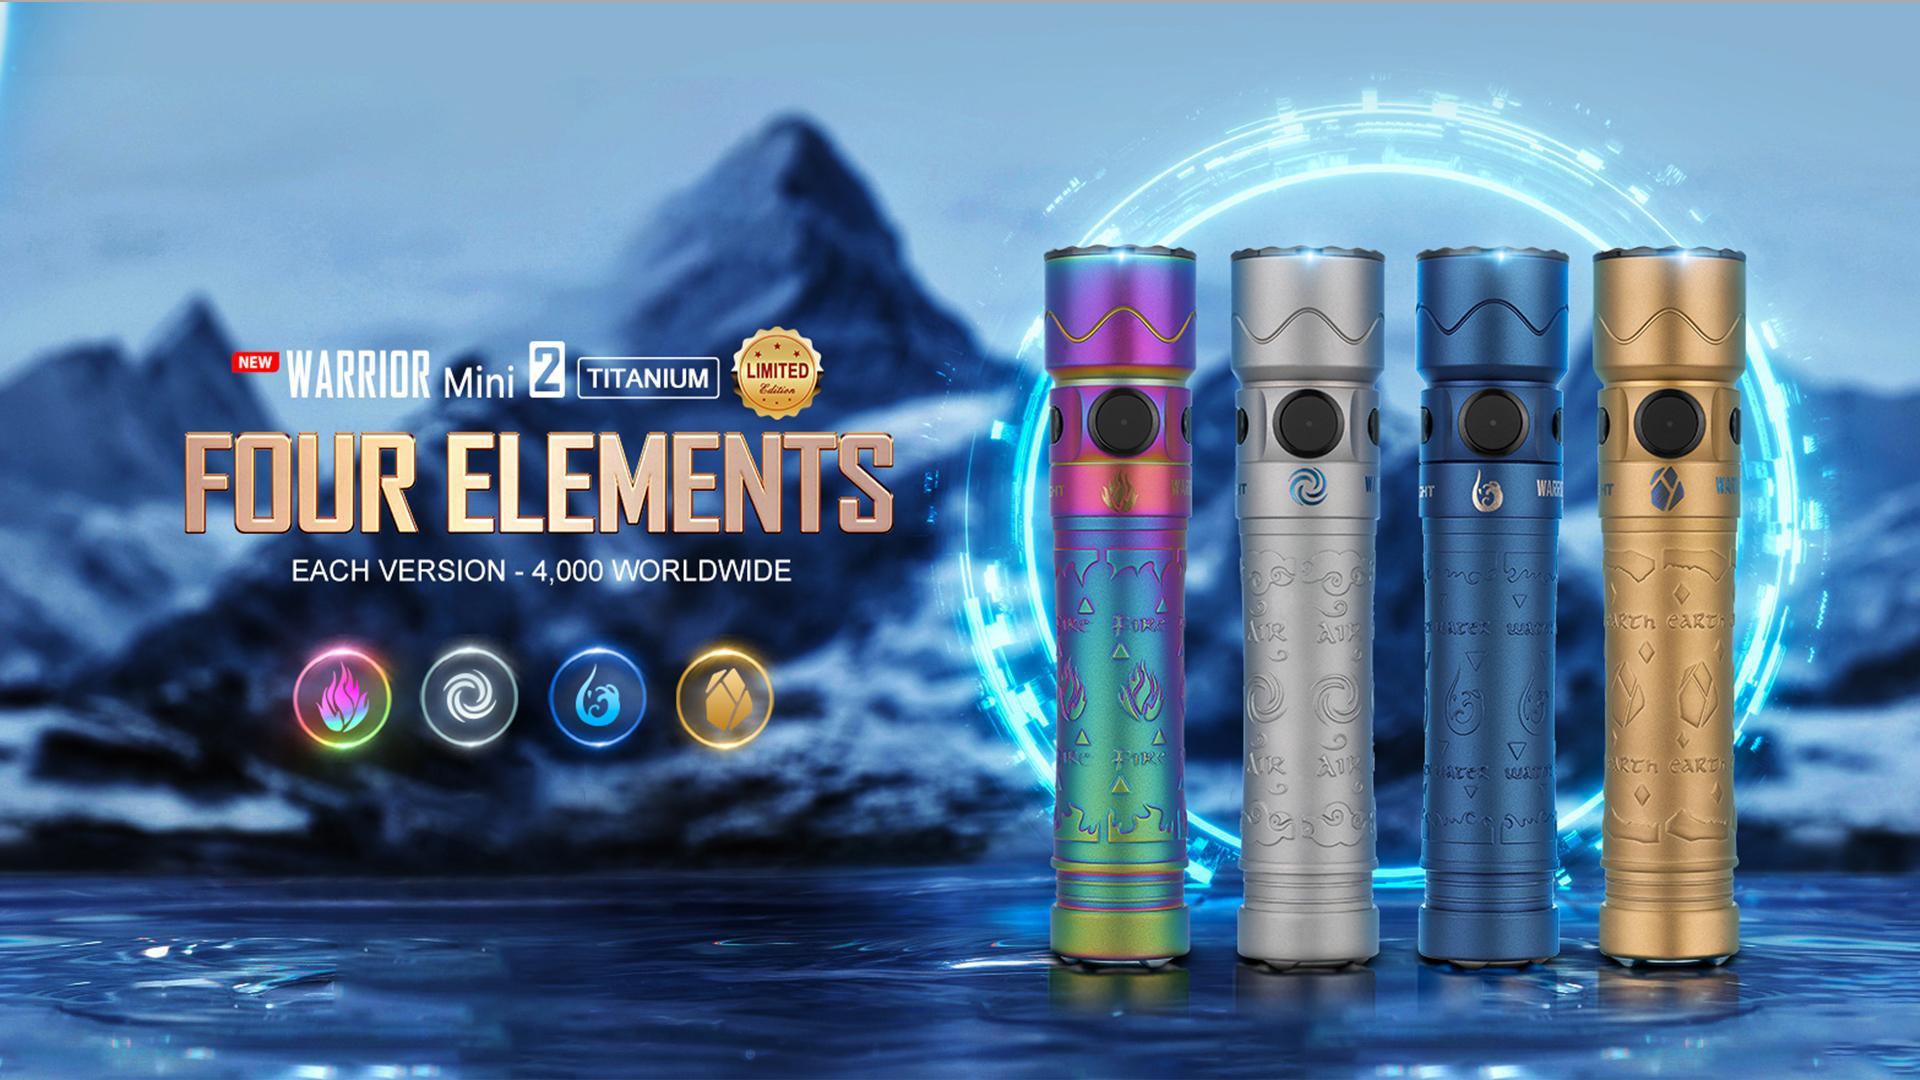 Warrior Mini 2 EDC Flashlight Titanium